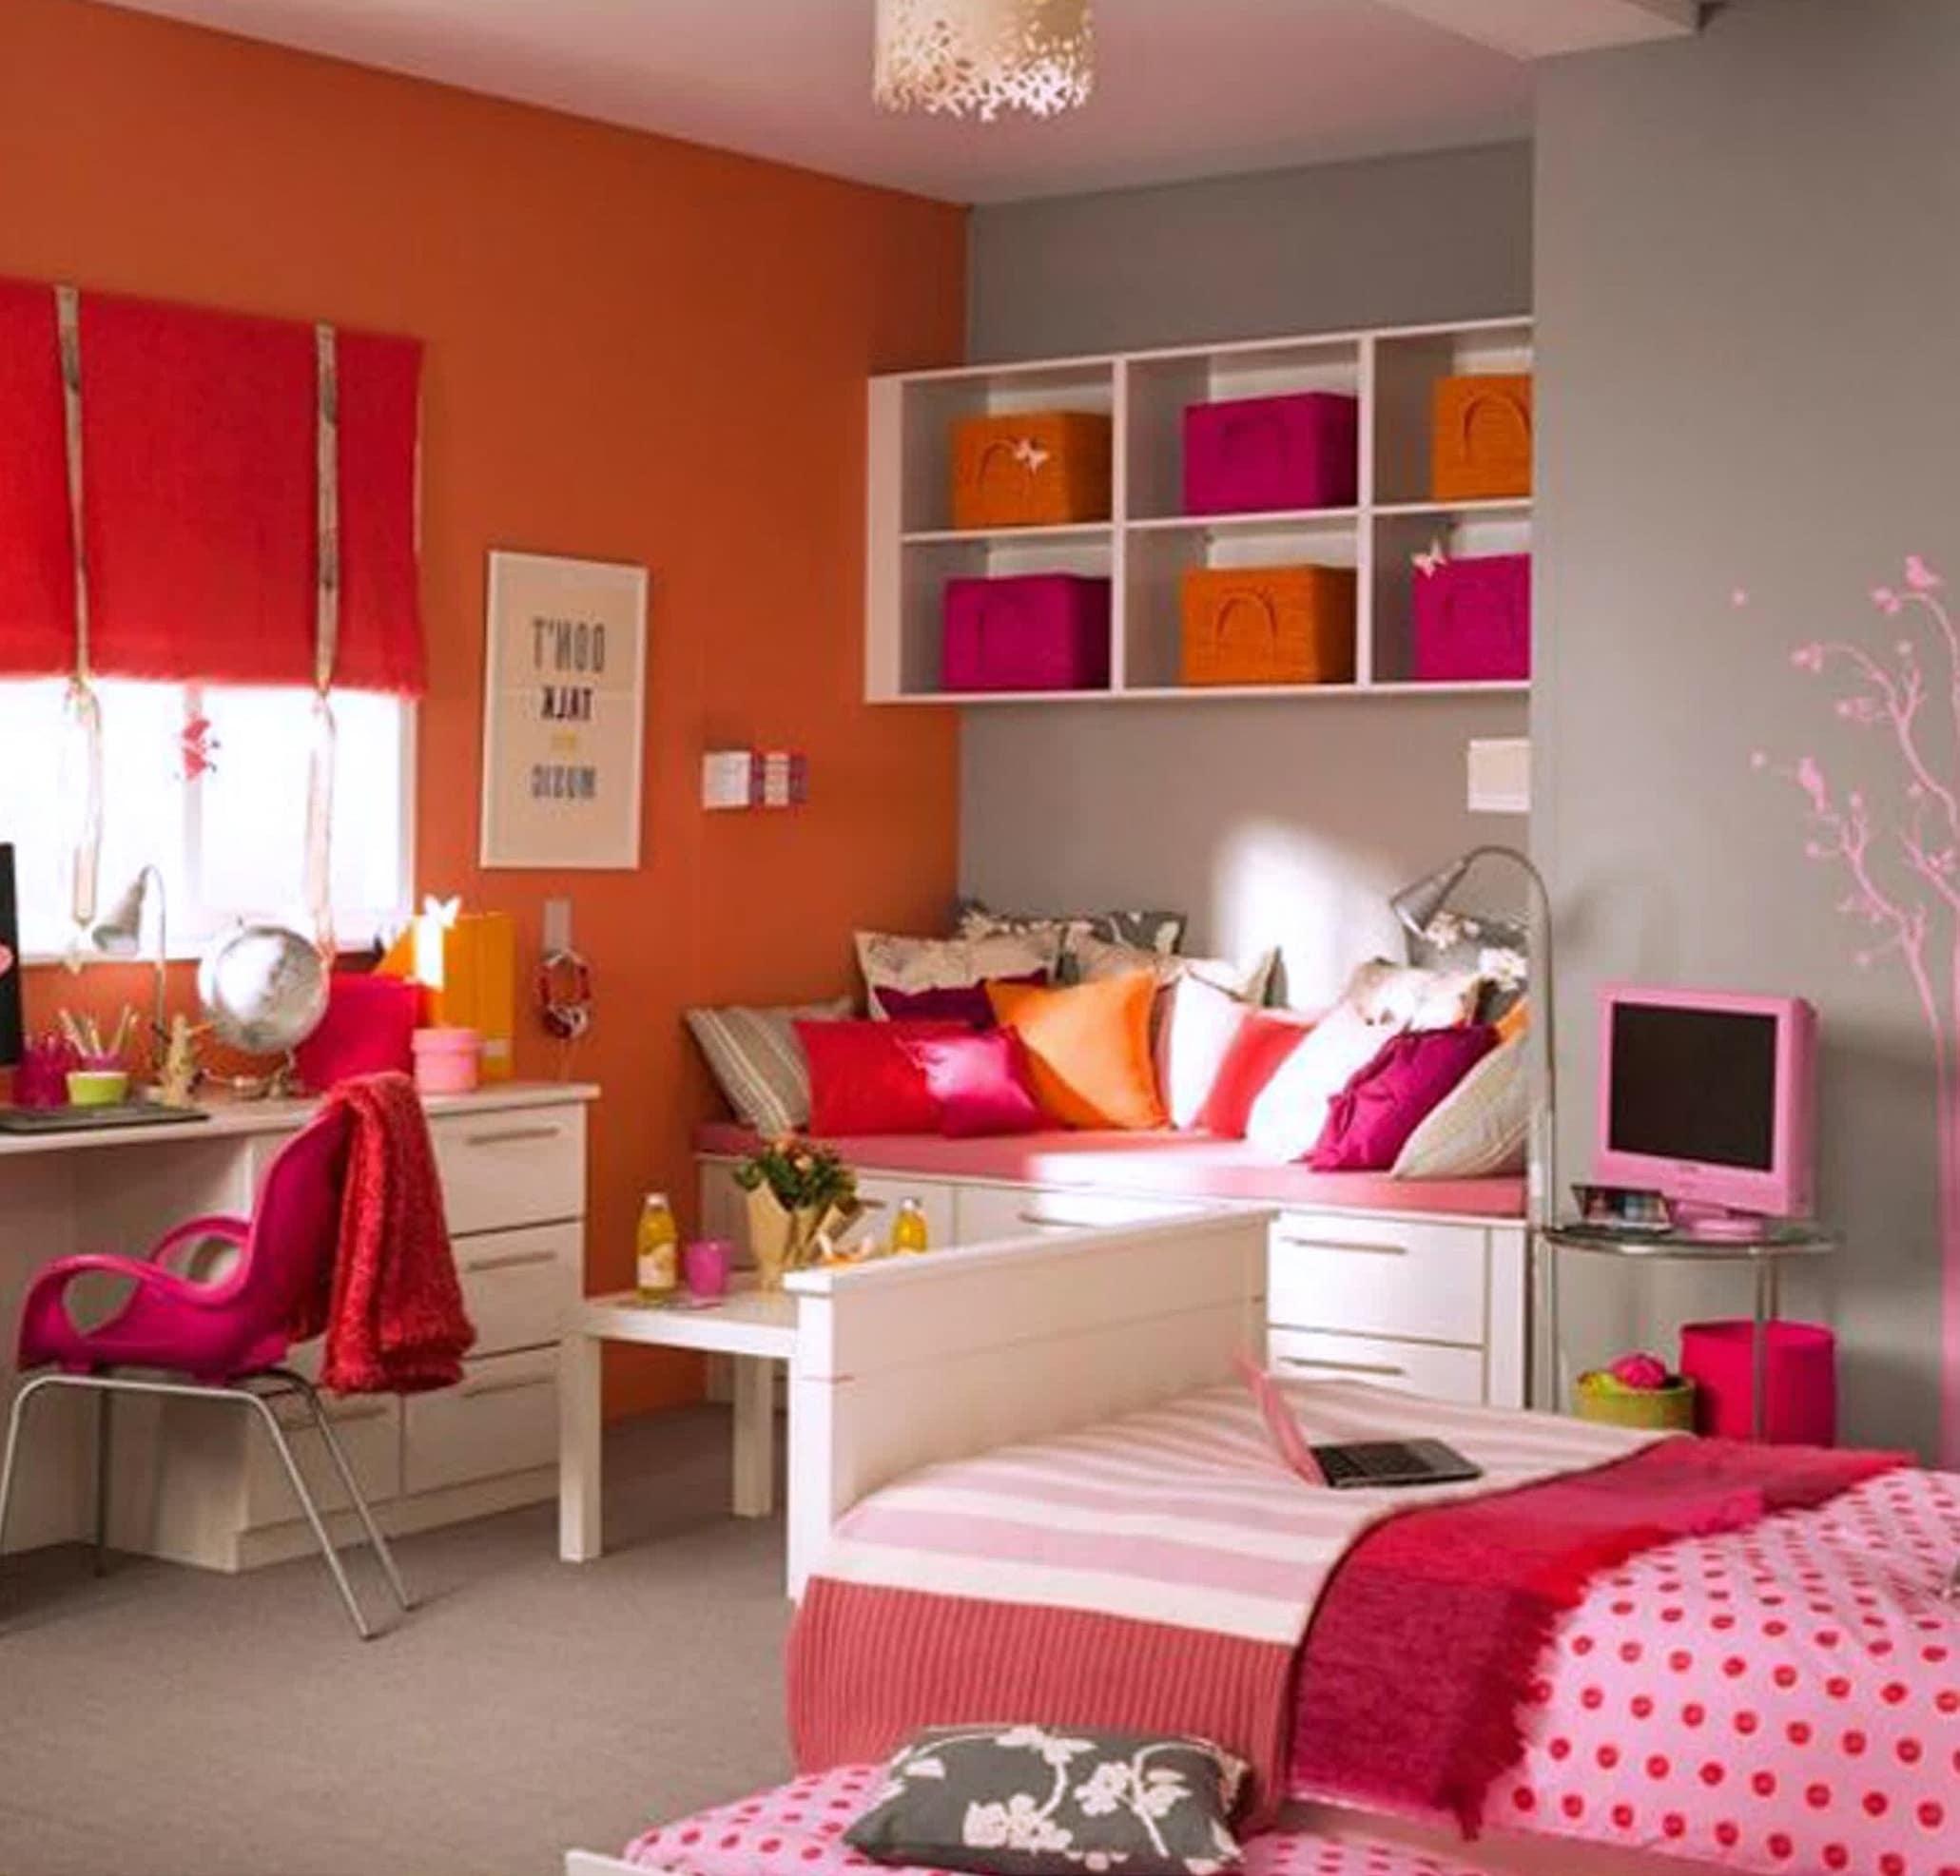 Girl Teen Room Rosa con Naranjo